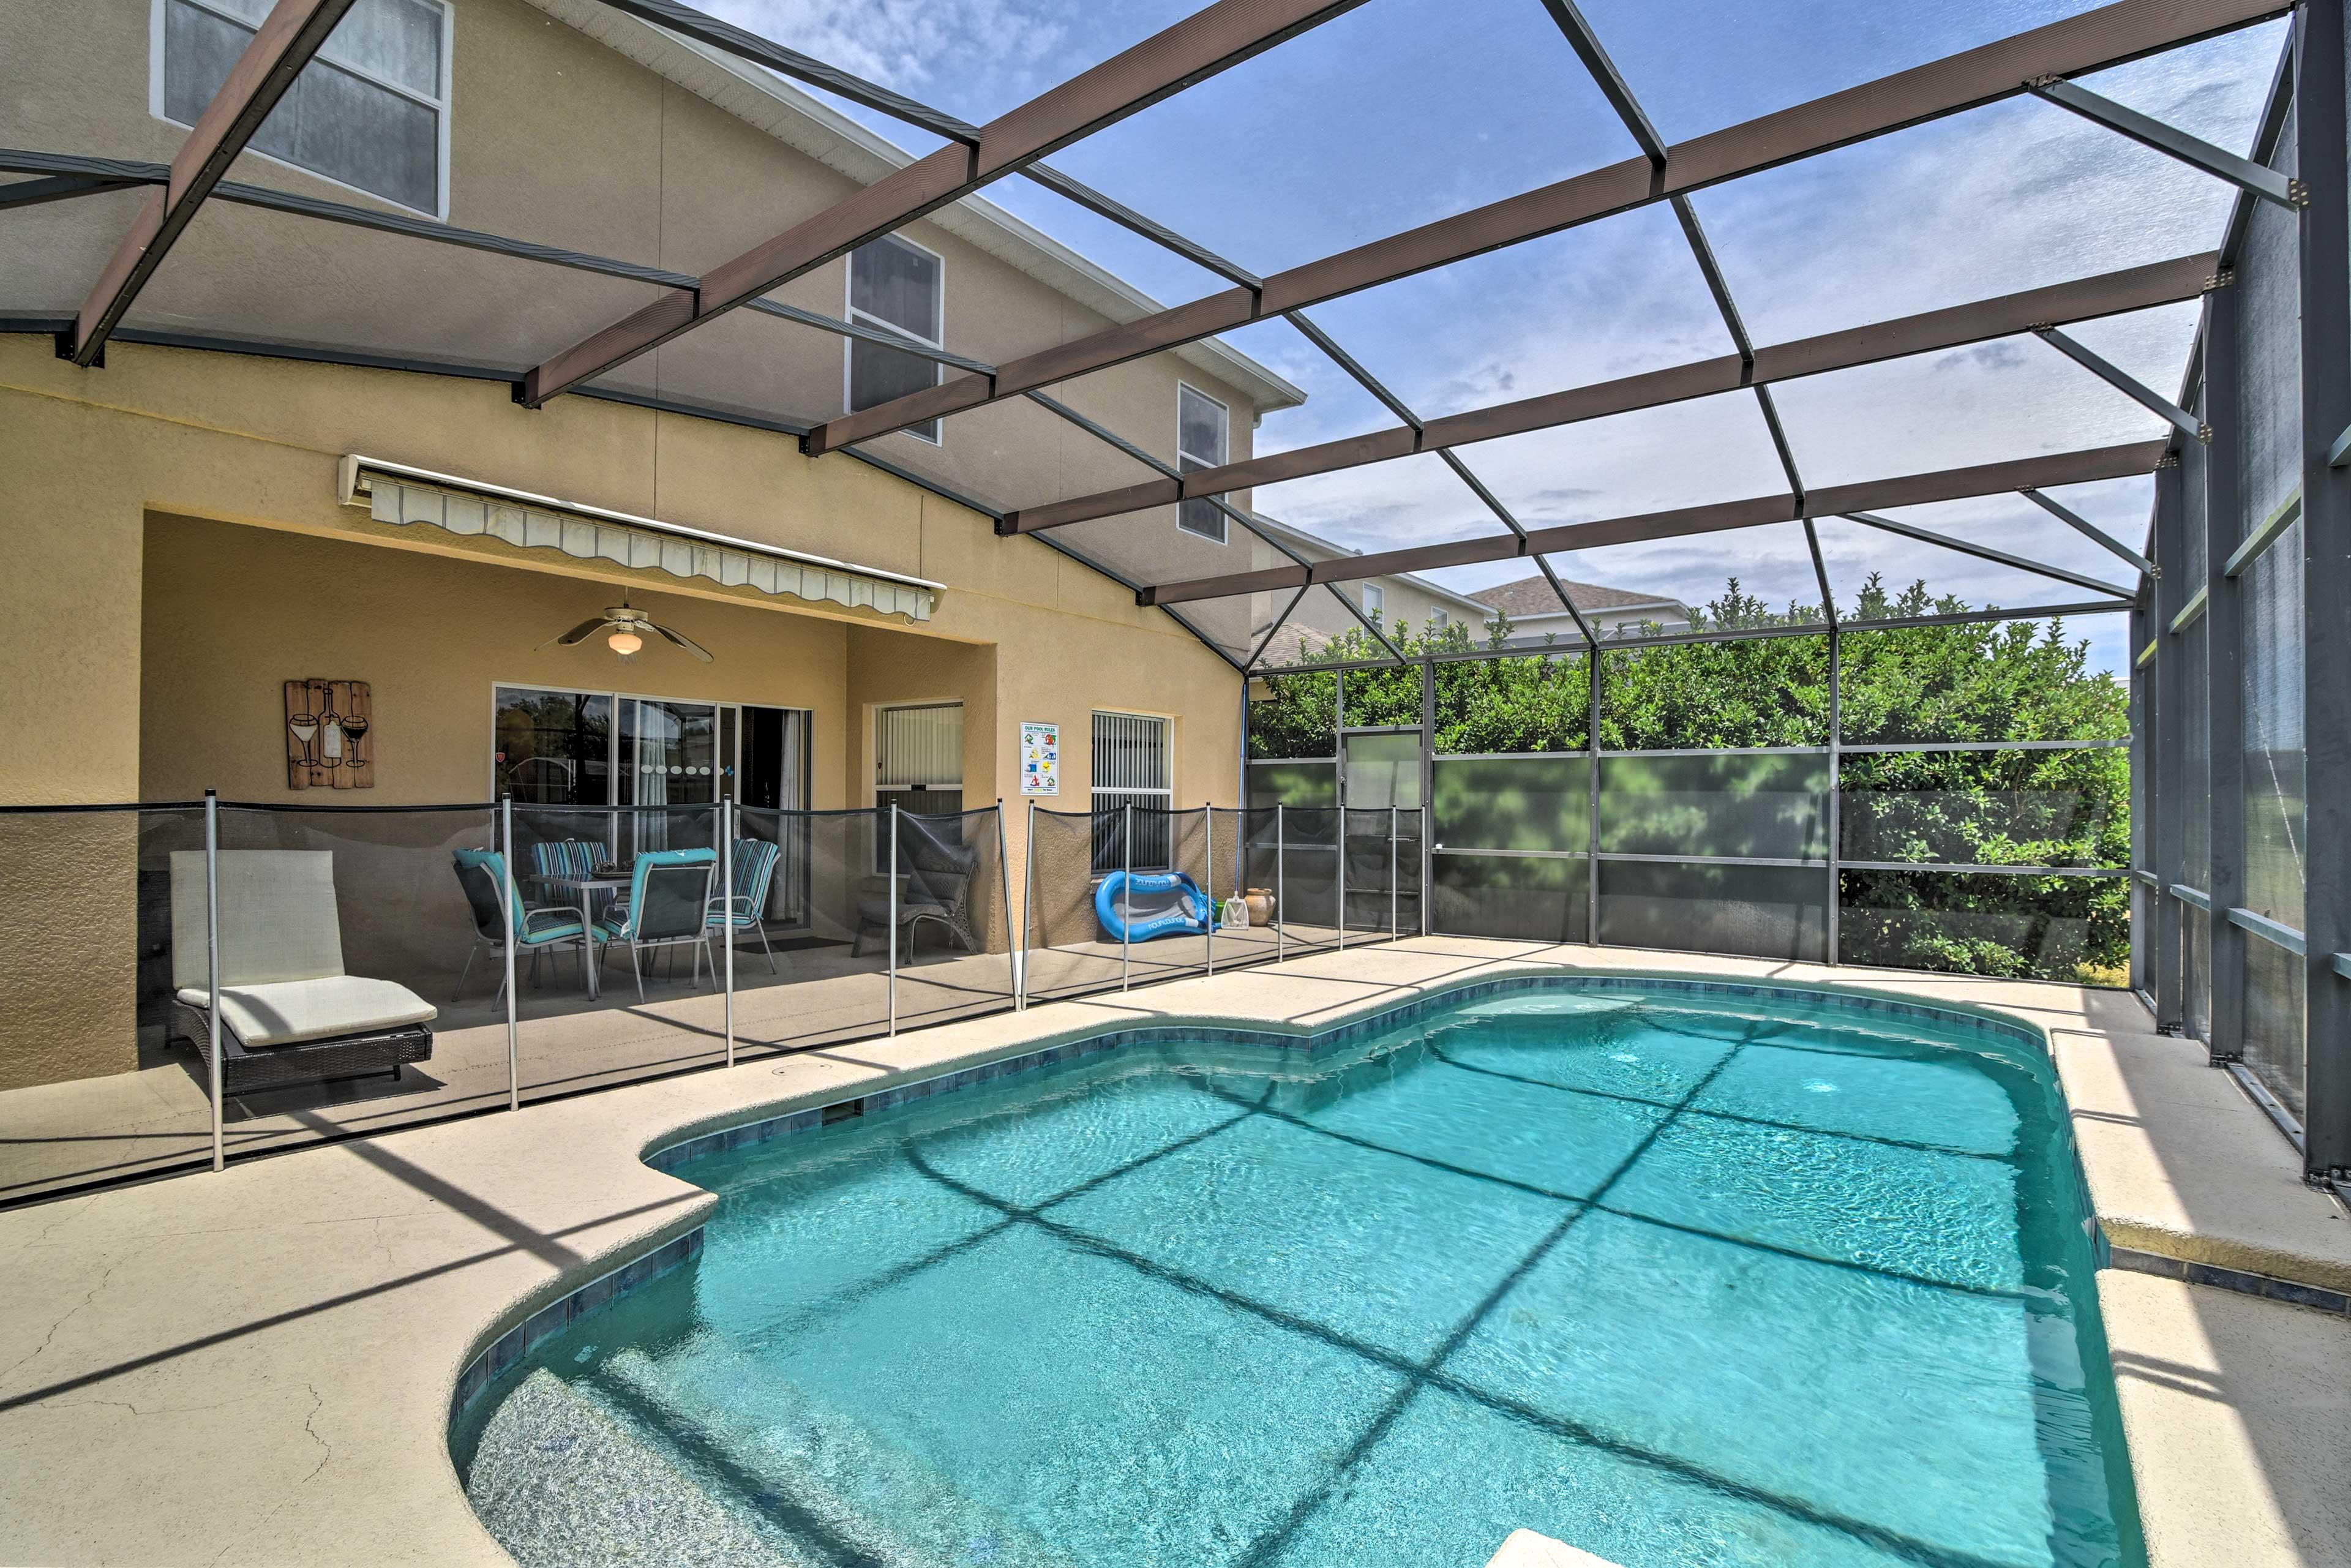 Make a splash in the private pool.